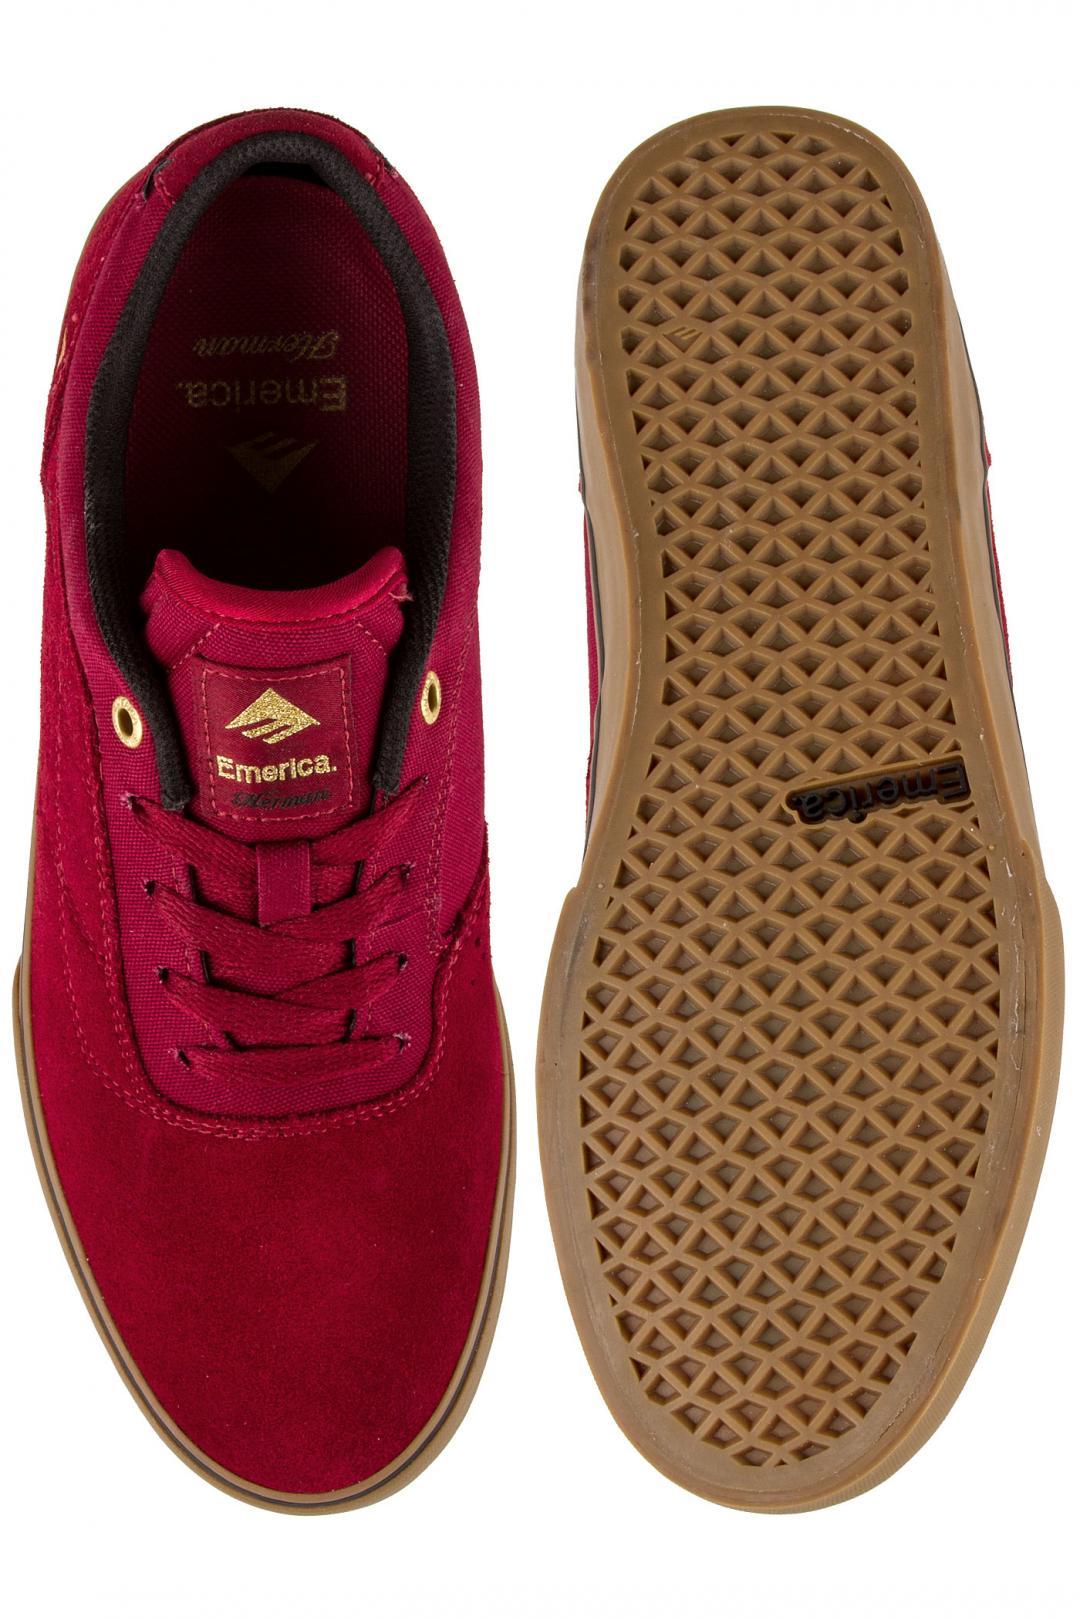 Uomo Emerica The Herman G6 Vulc burgundy gum | Sneaker